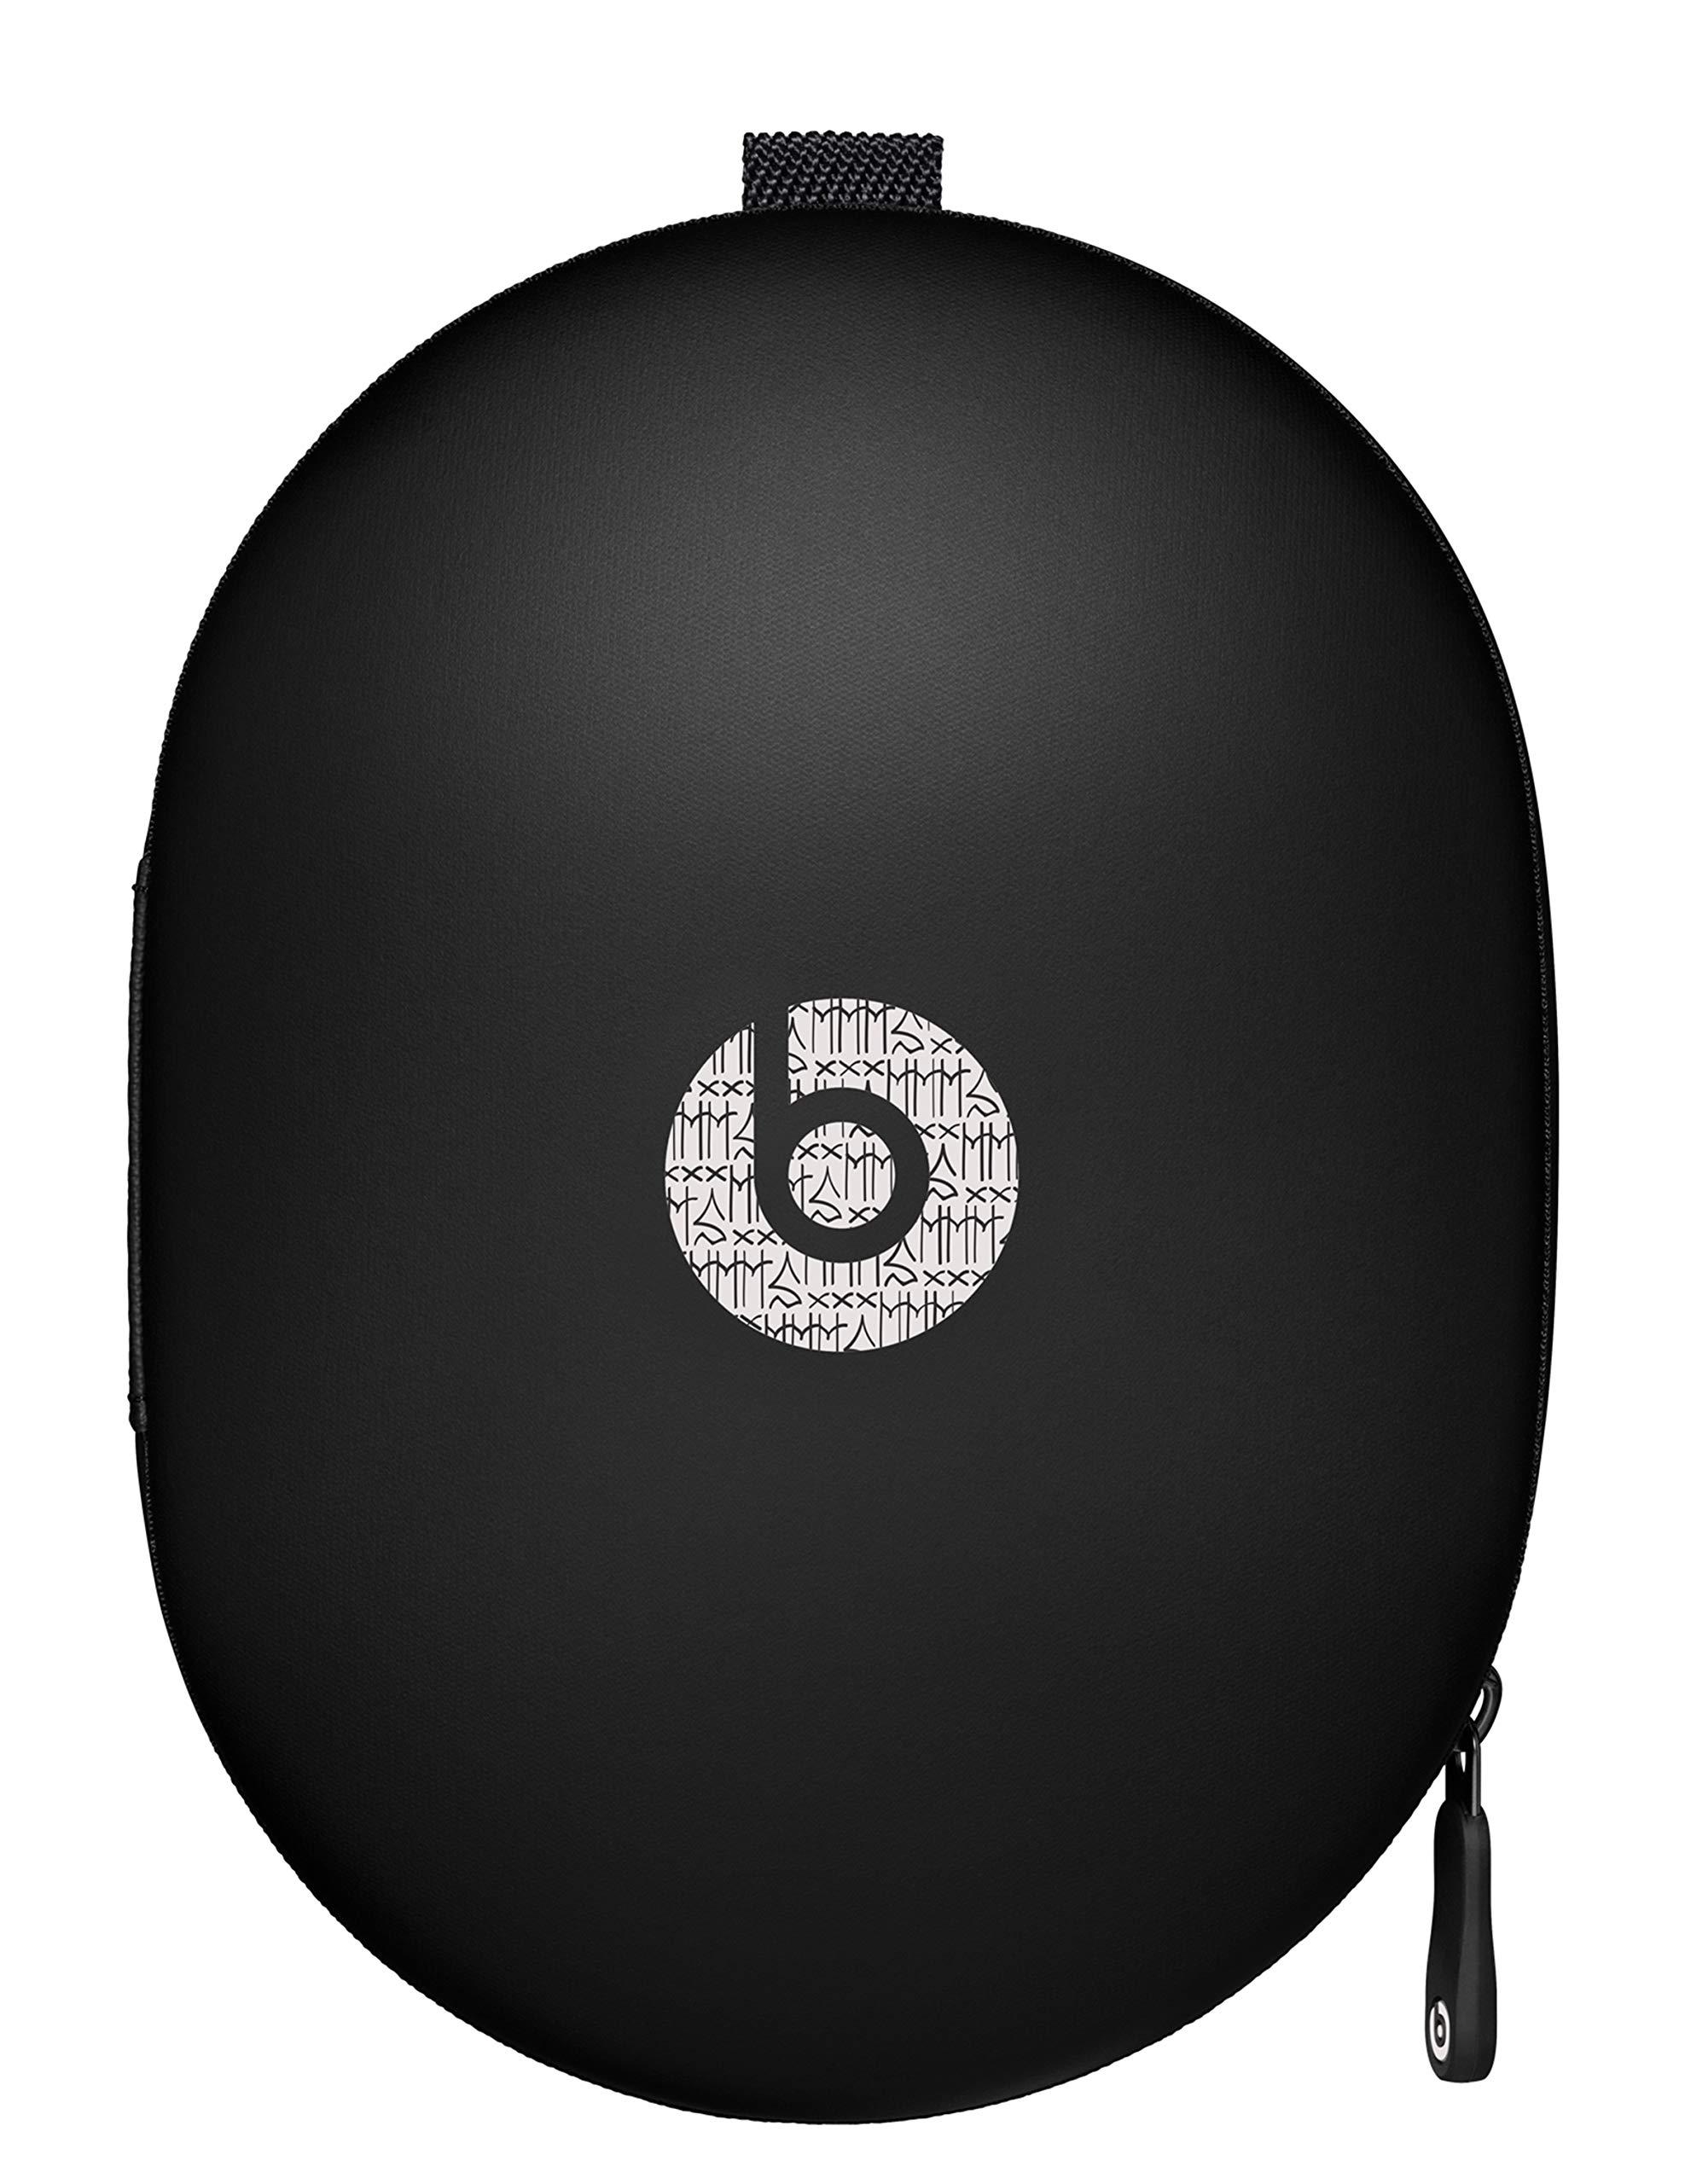 Beats Studio3 Wireless Headphones - Neymar Jr. Custom Edition